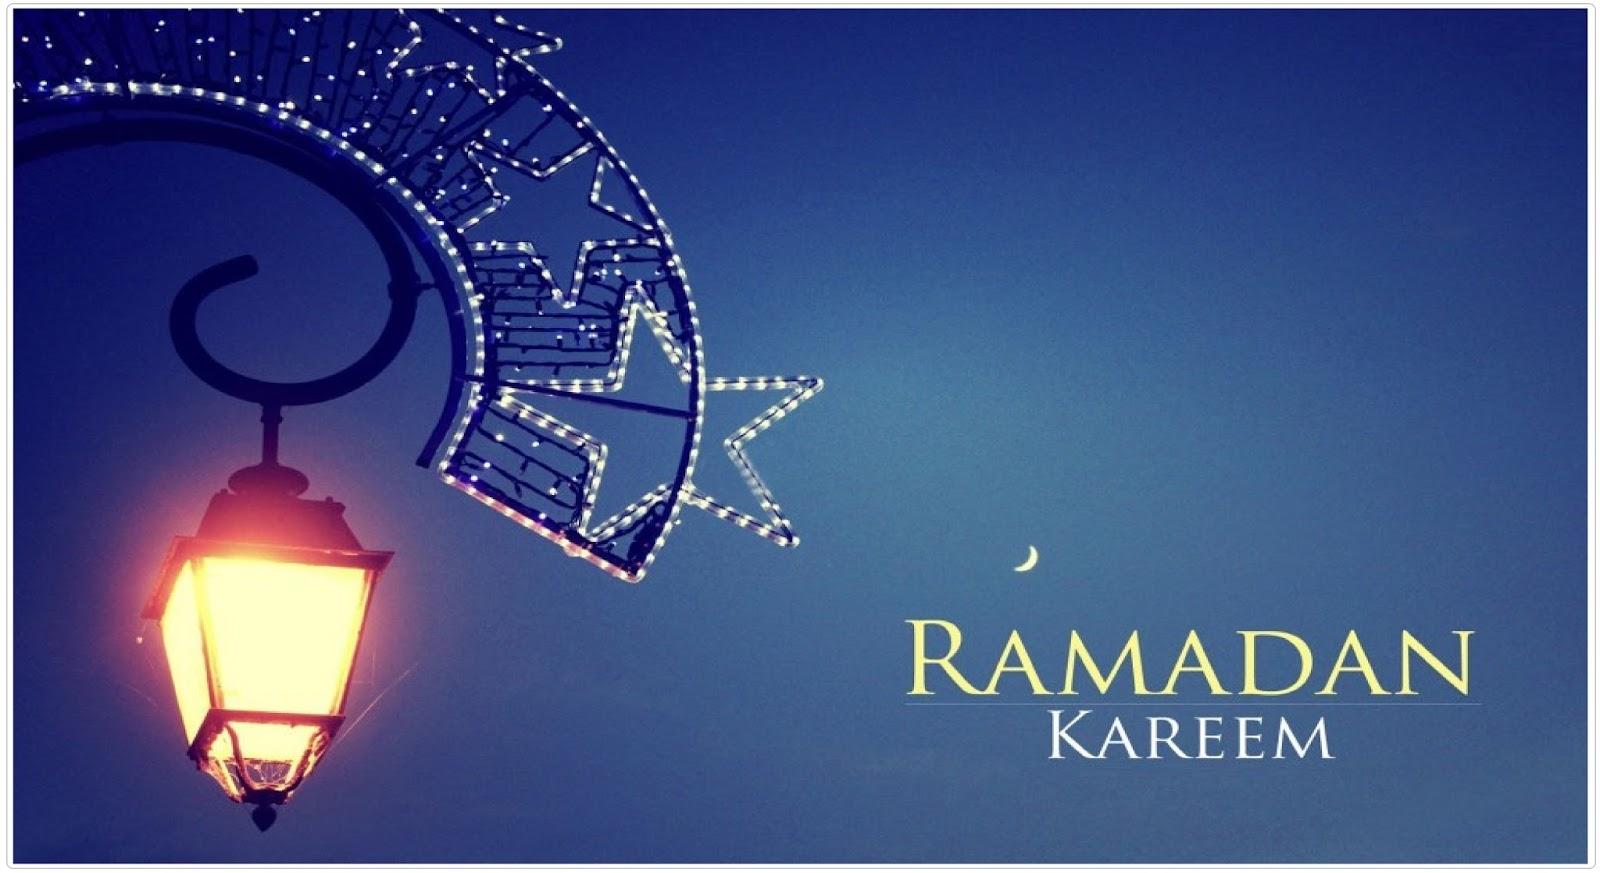 Eid mubarak wishes2018 quotes messages sms greetings status 2018 ramadan eid greetings m4hsunfo